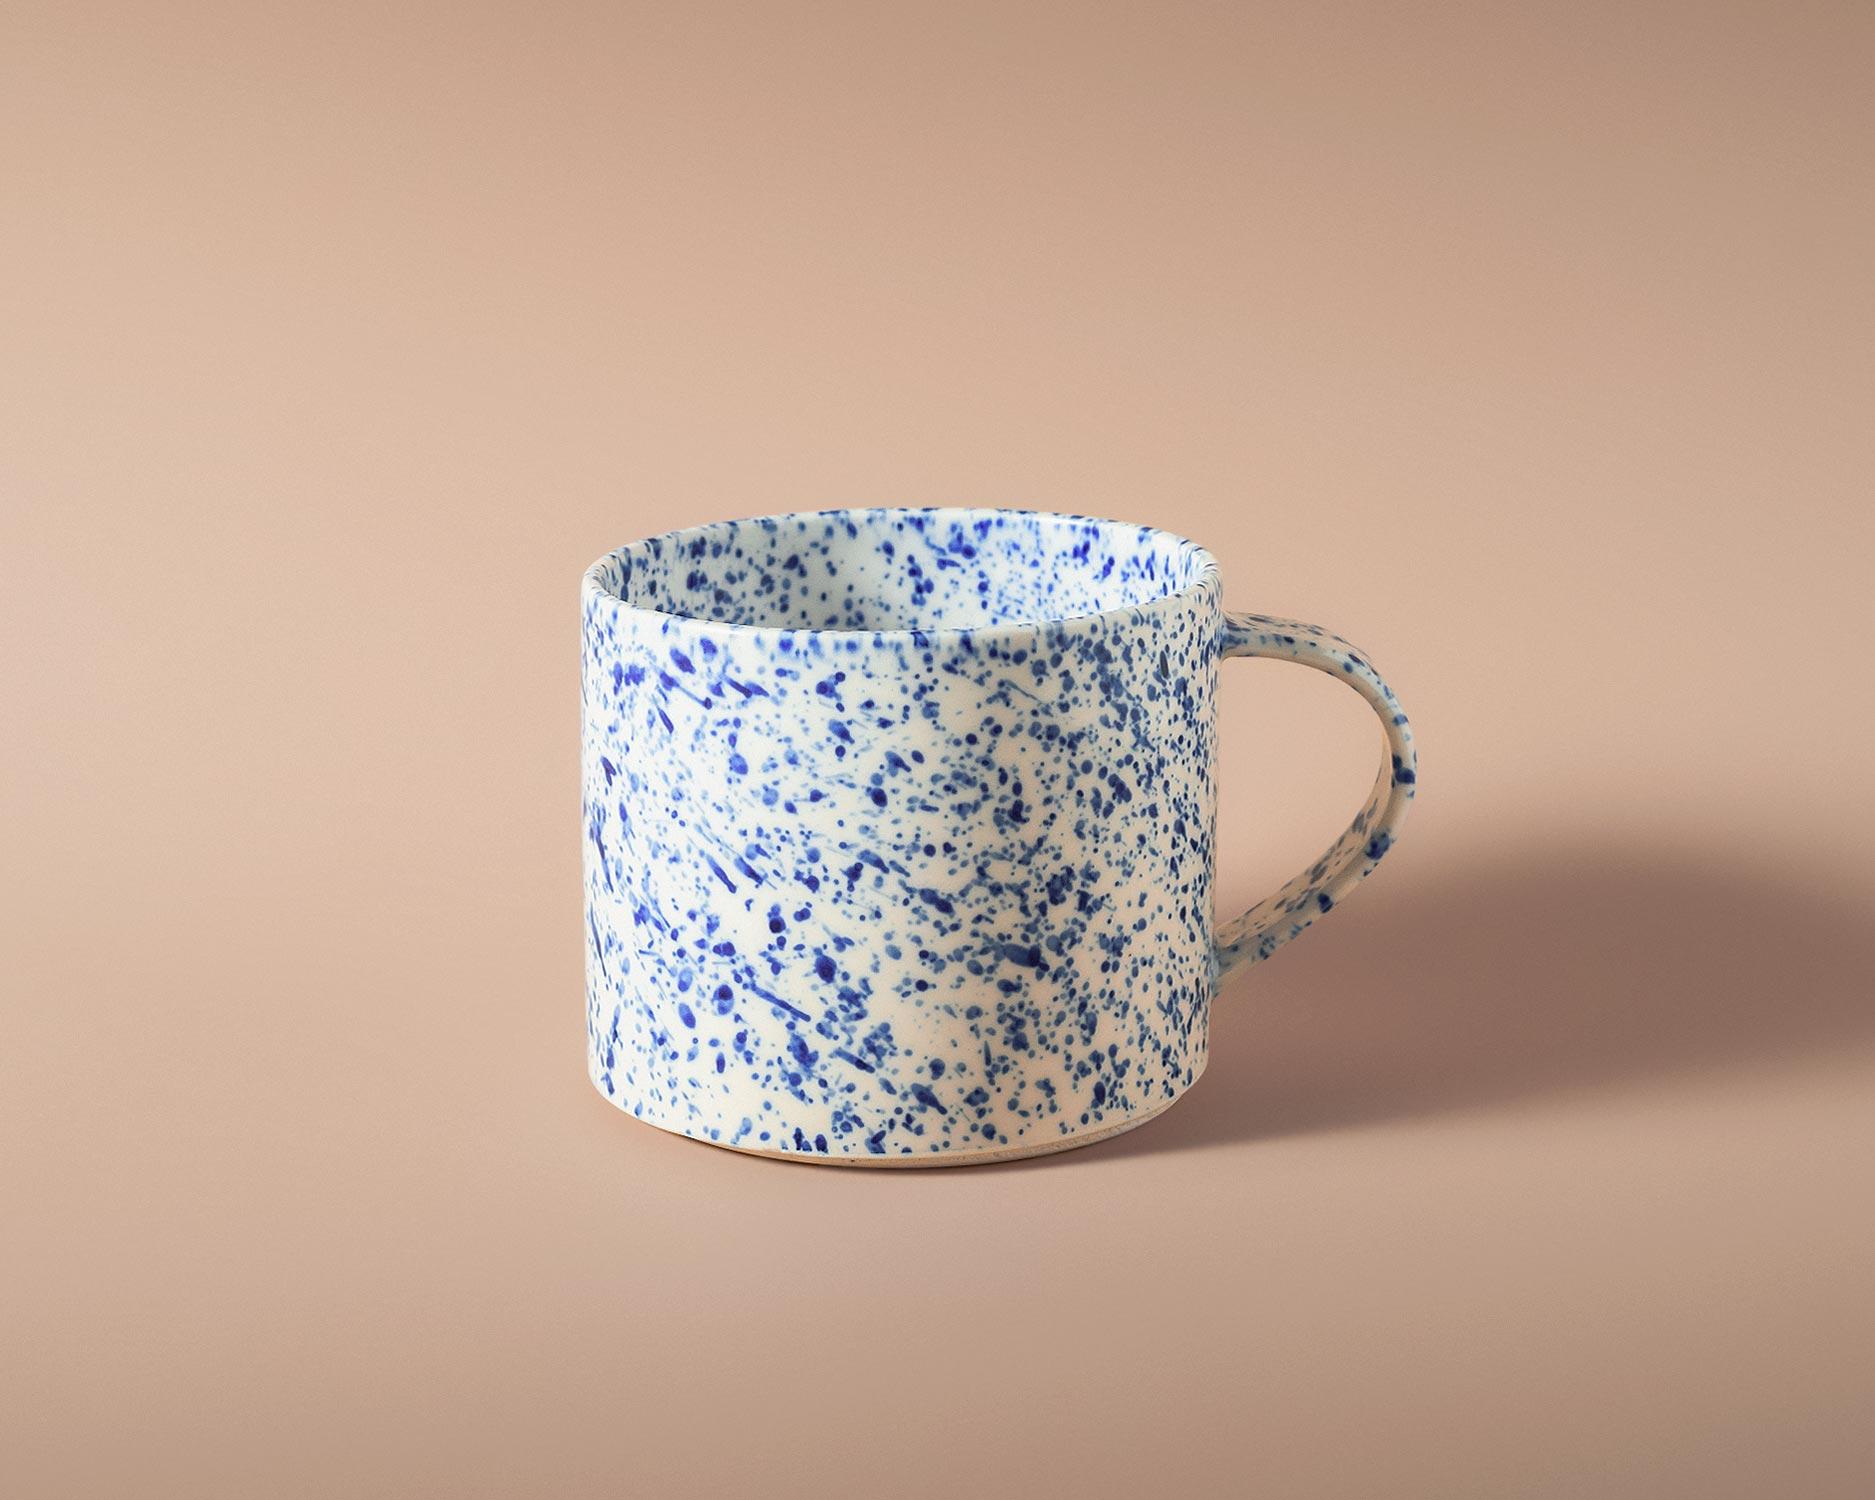 nebolusa-tea-cup-blue-3-pp.jpg